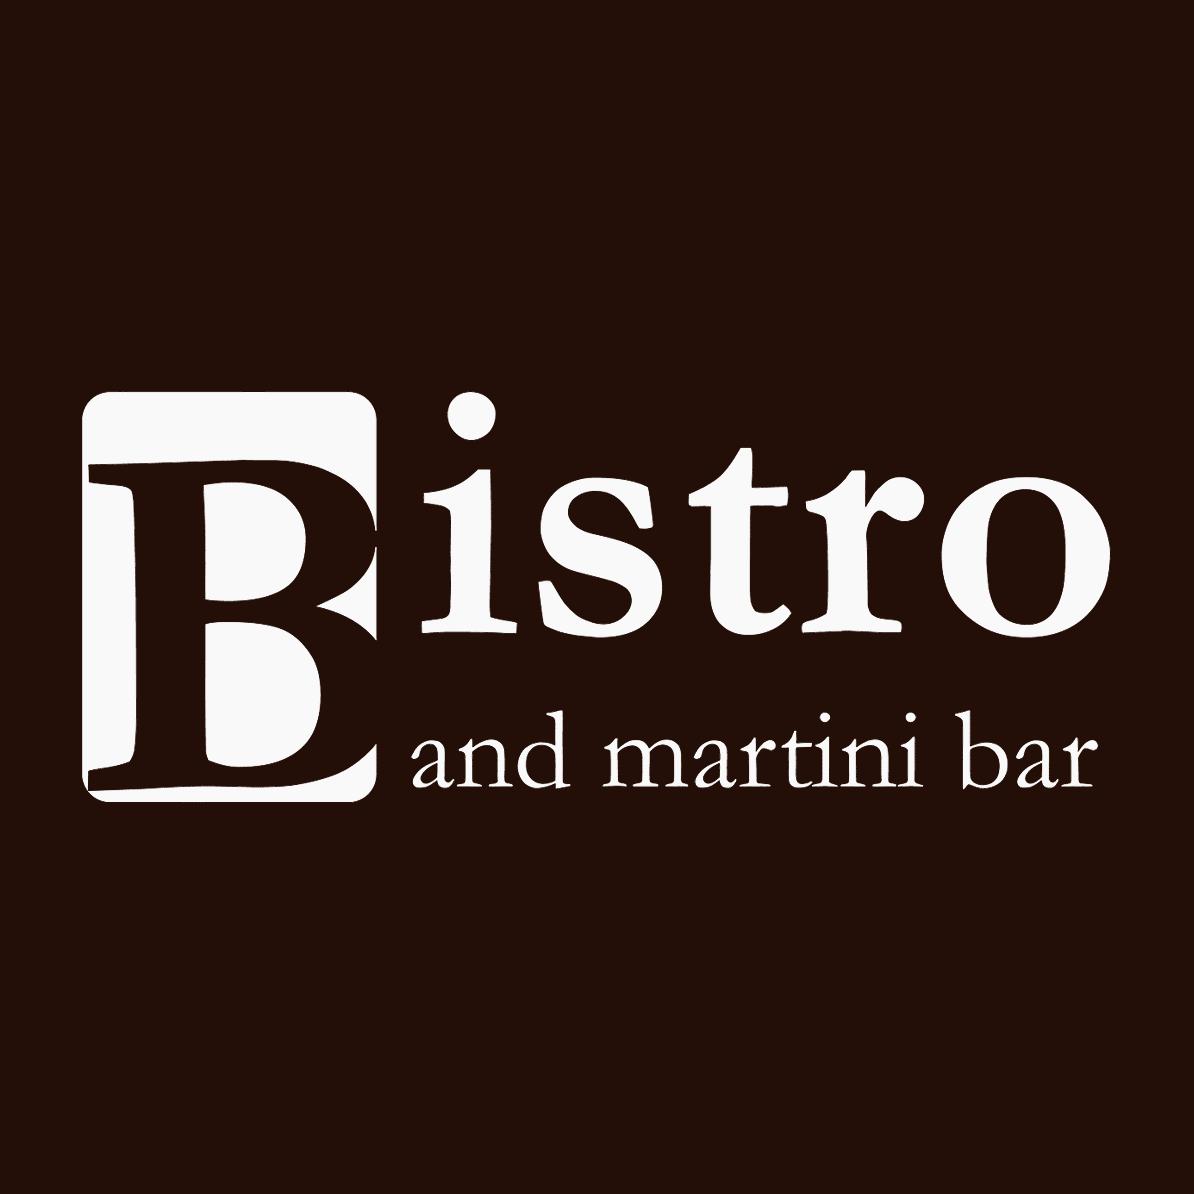 BISTRO.png